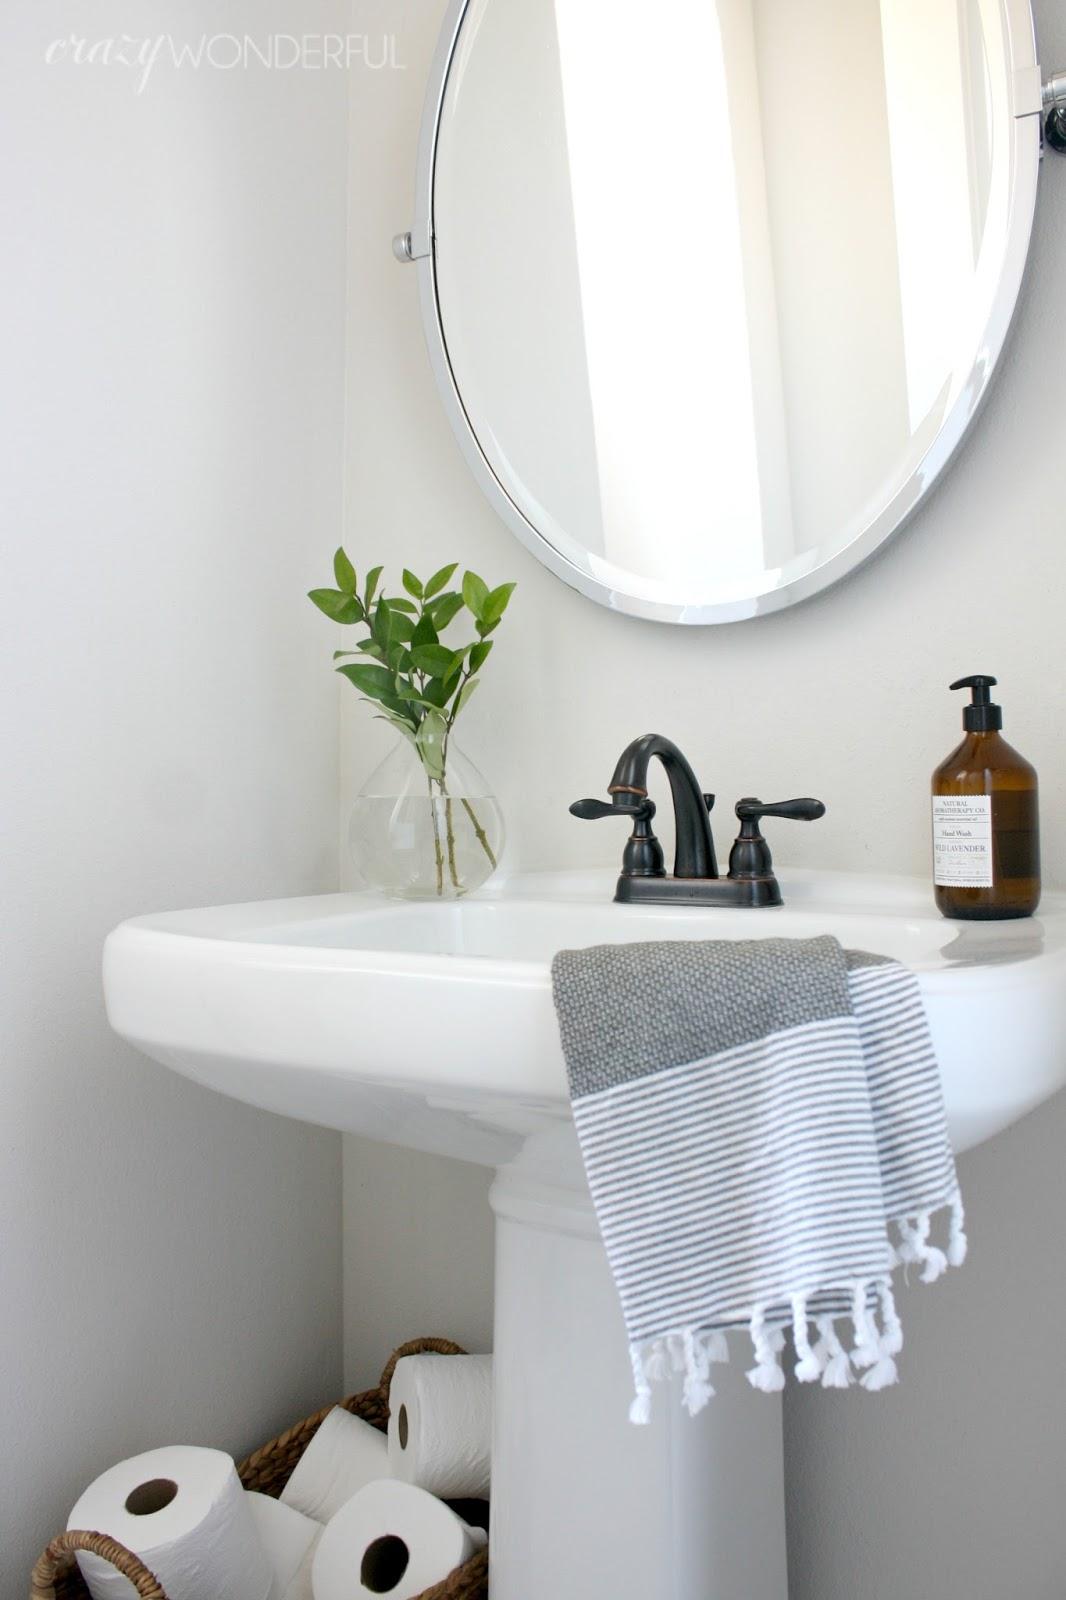 how to fix a boring builder grade bathroom - Crazy Wonderful